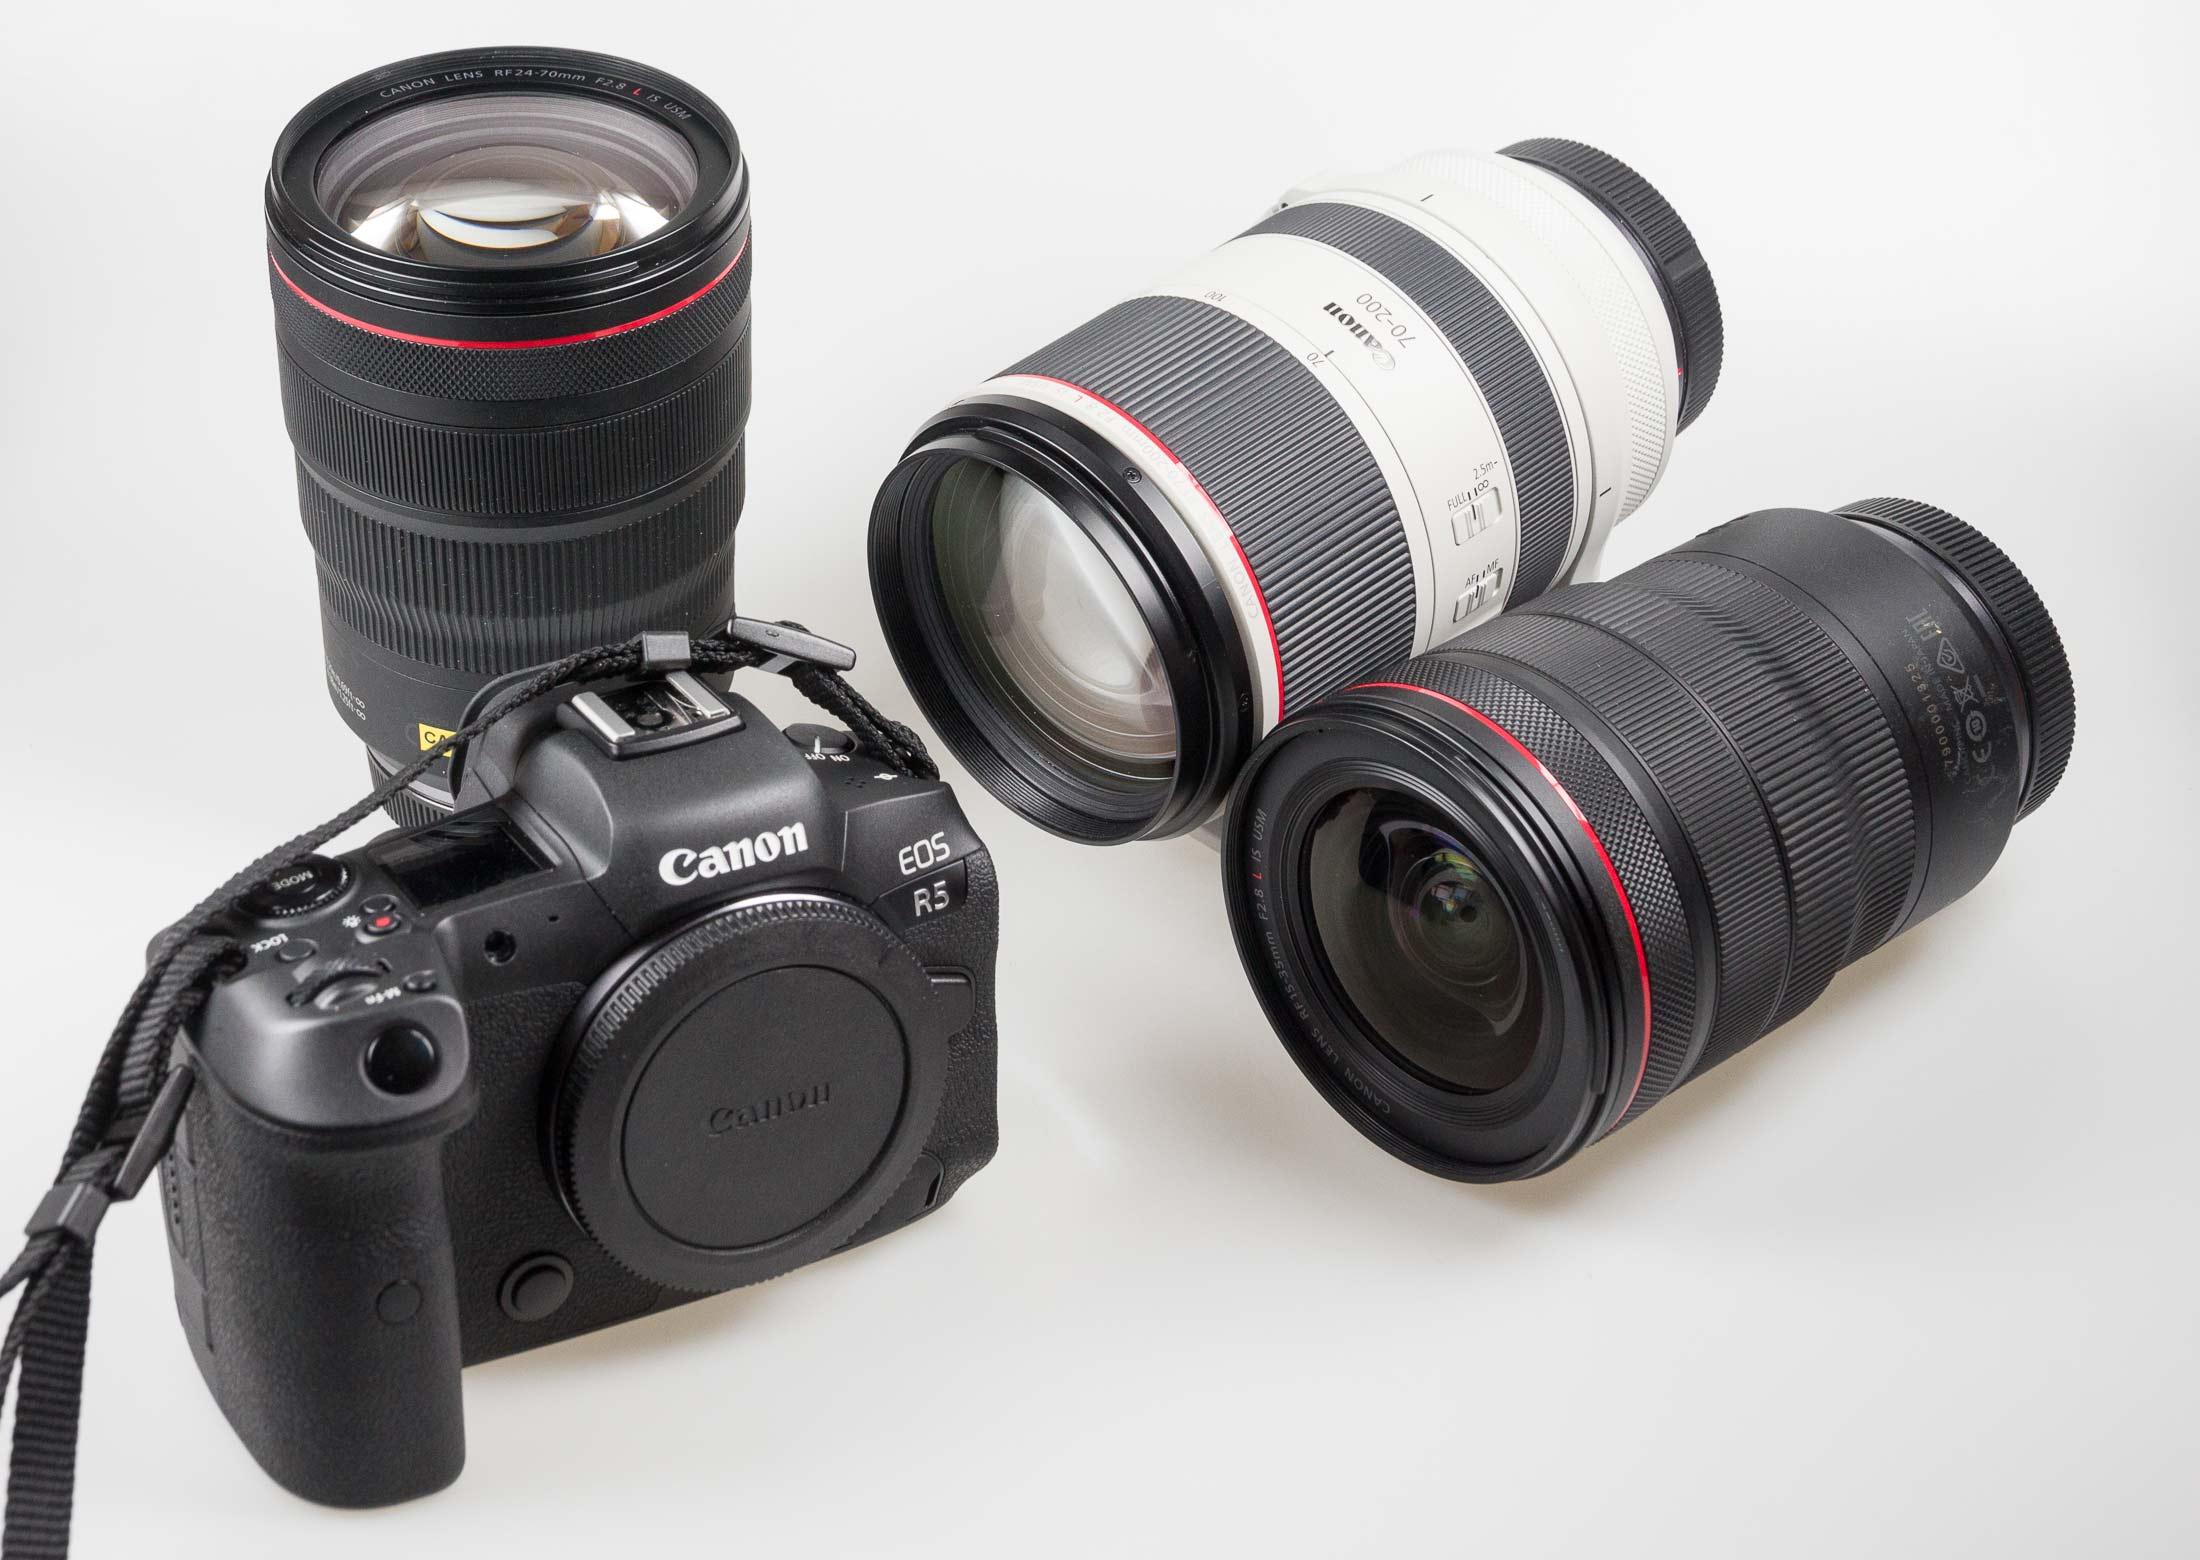 R5 camera and RF lenses